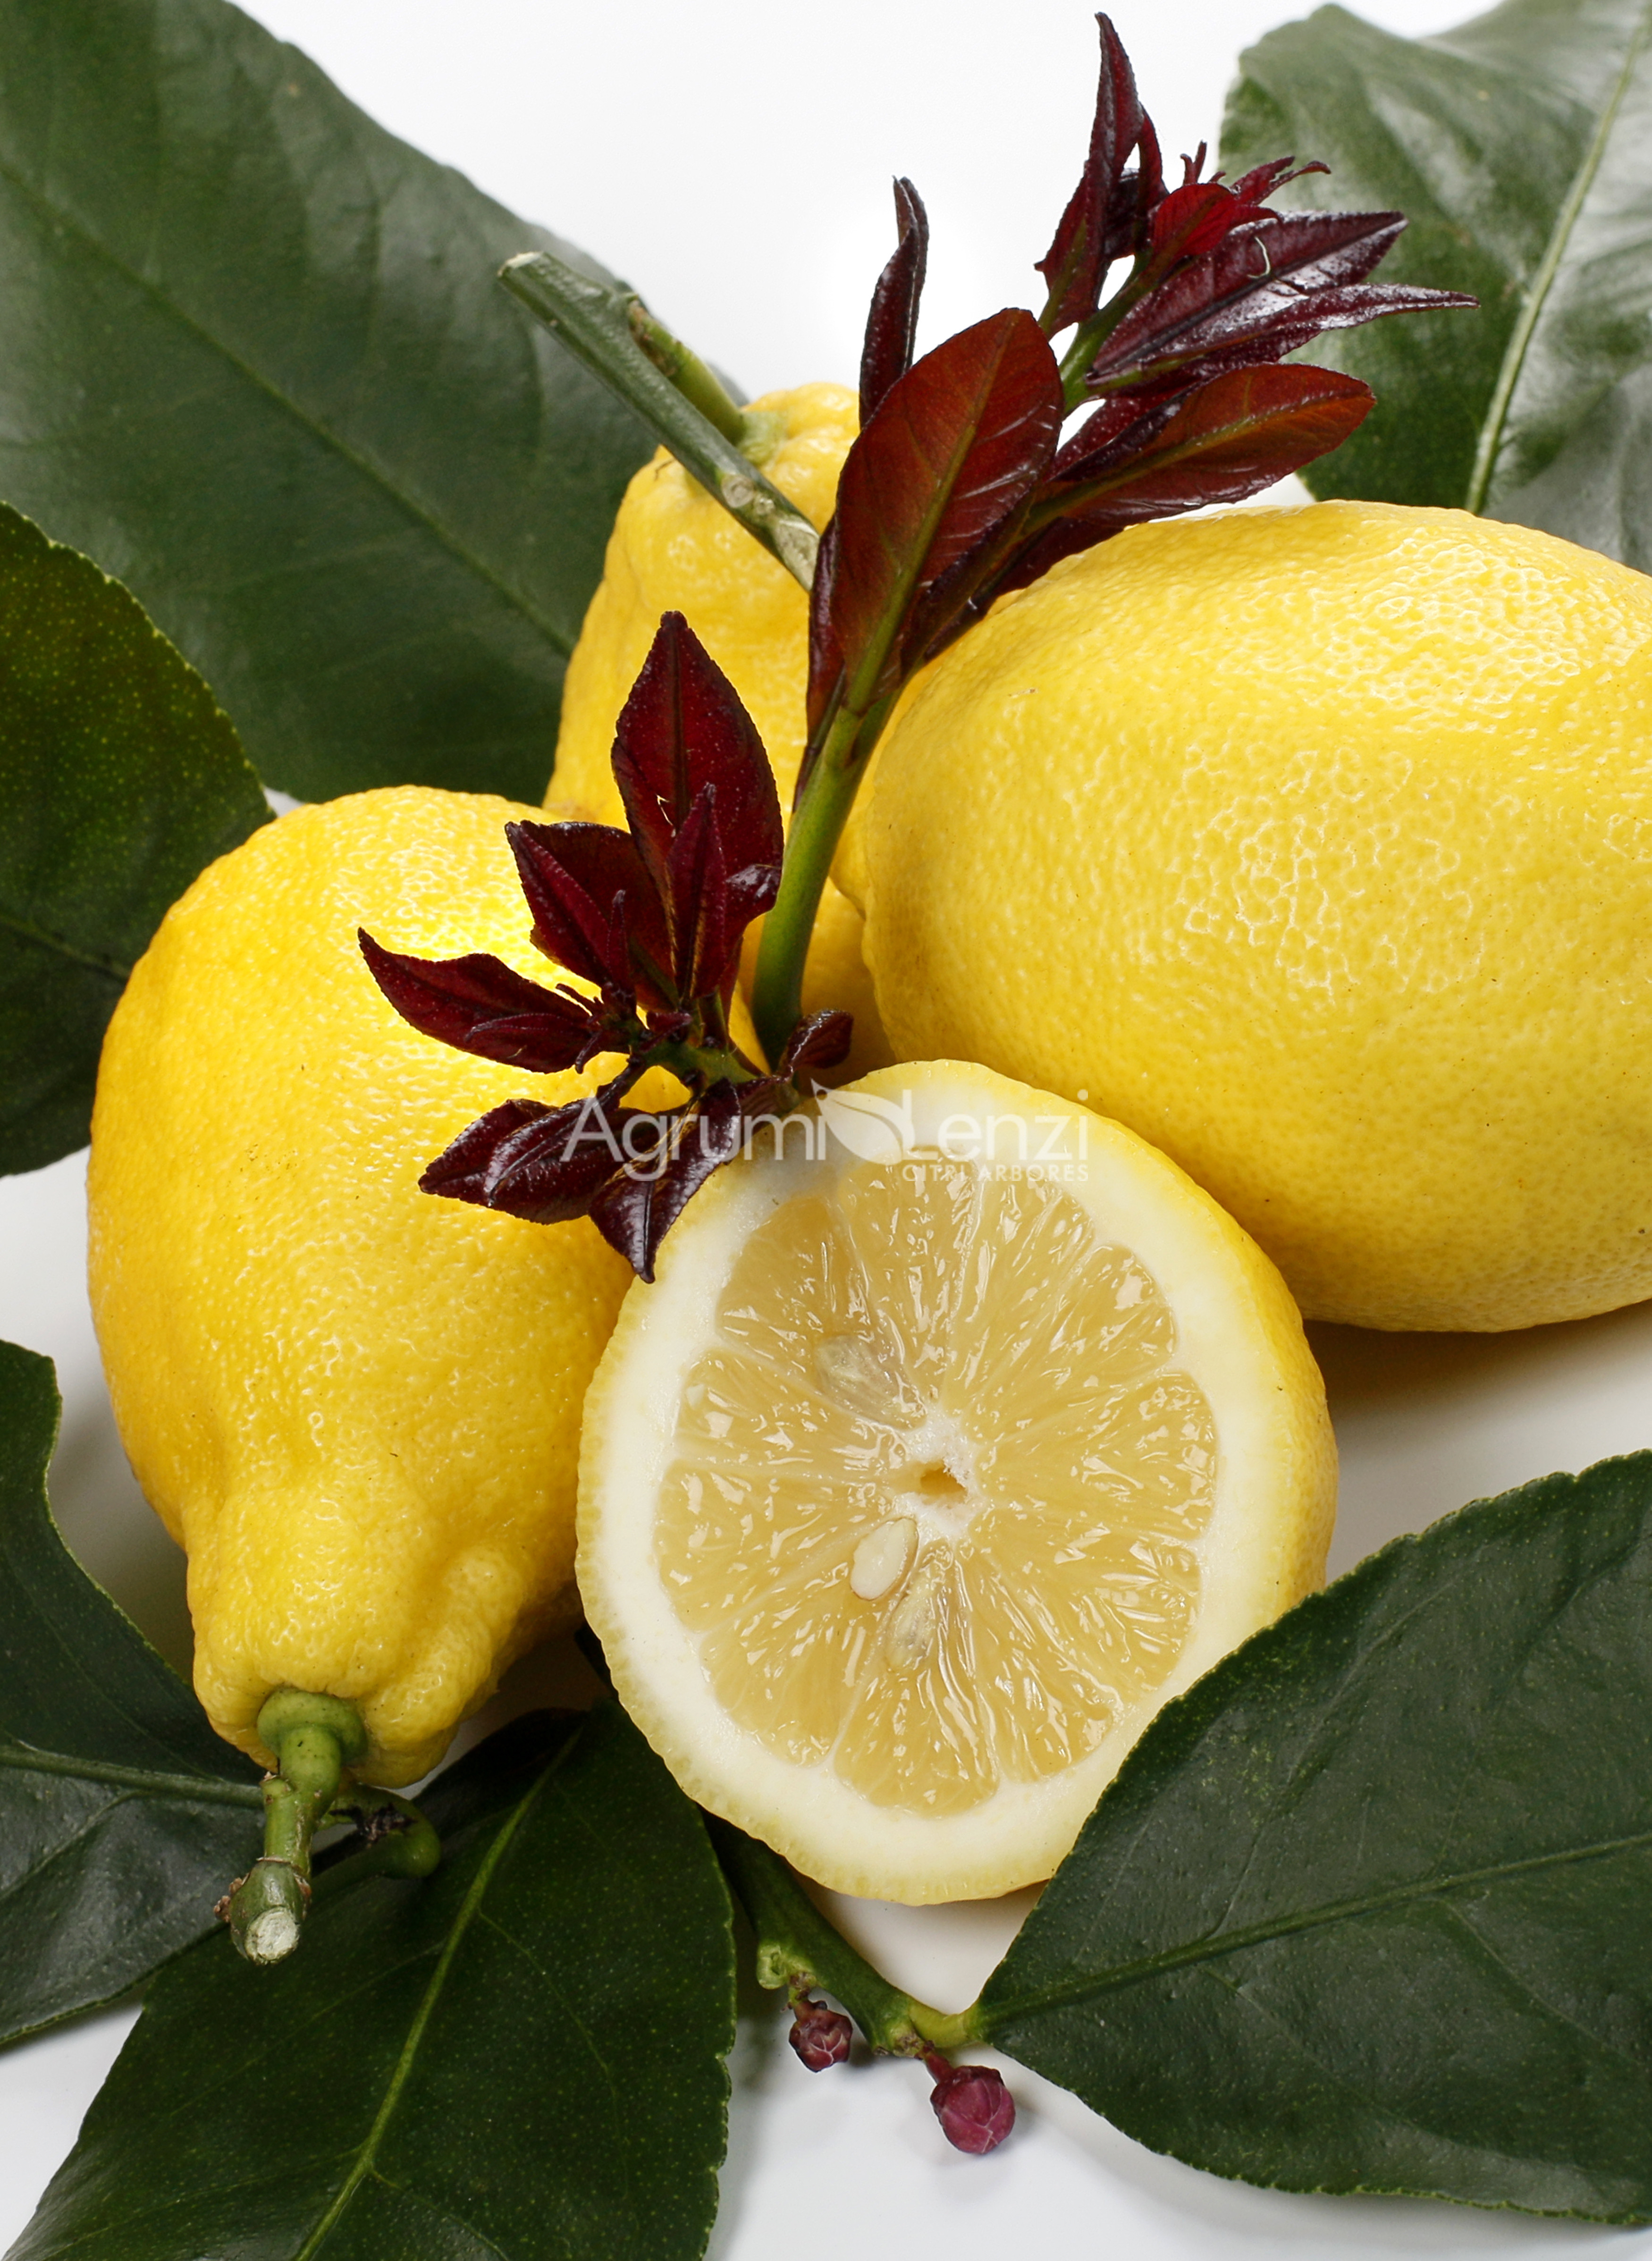 limone carrubaro citrus limon agrumi lenzi. Black Bedroom Furniture Sets. Home Design Ideas